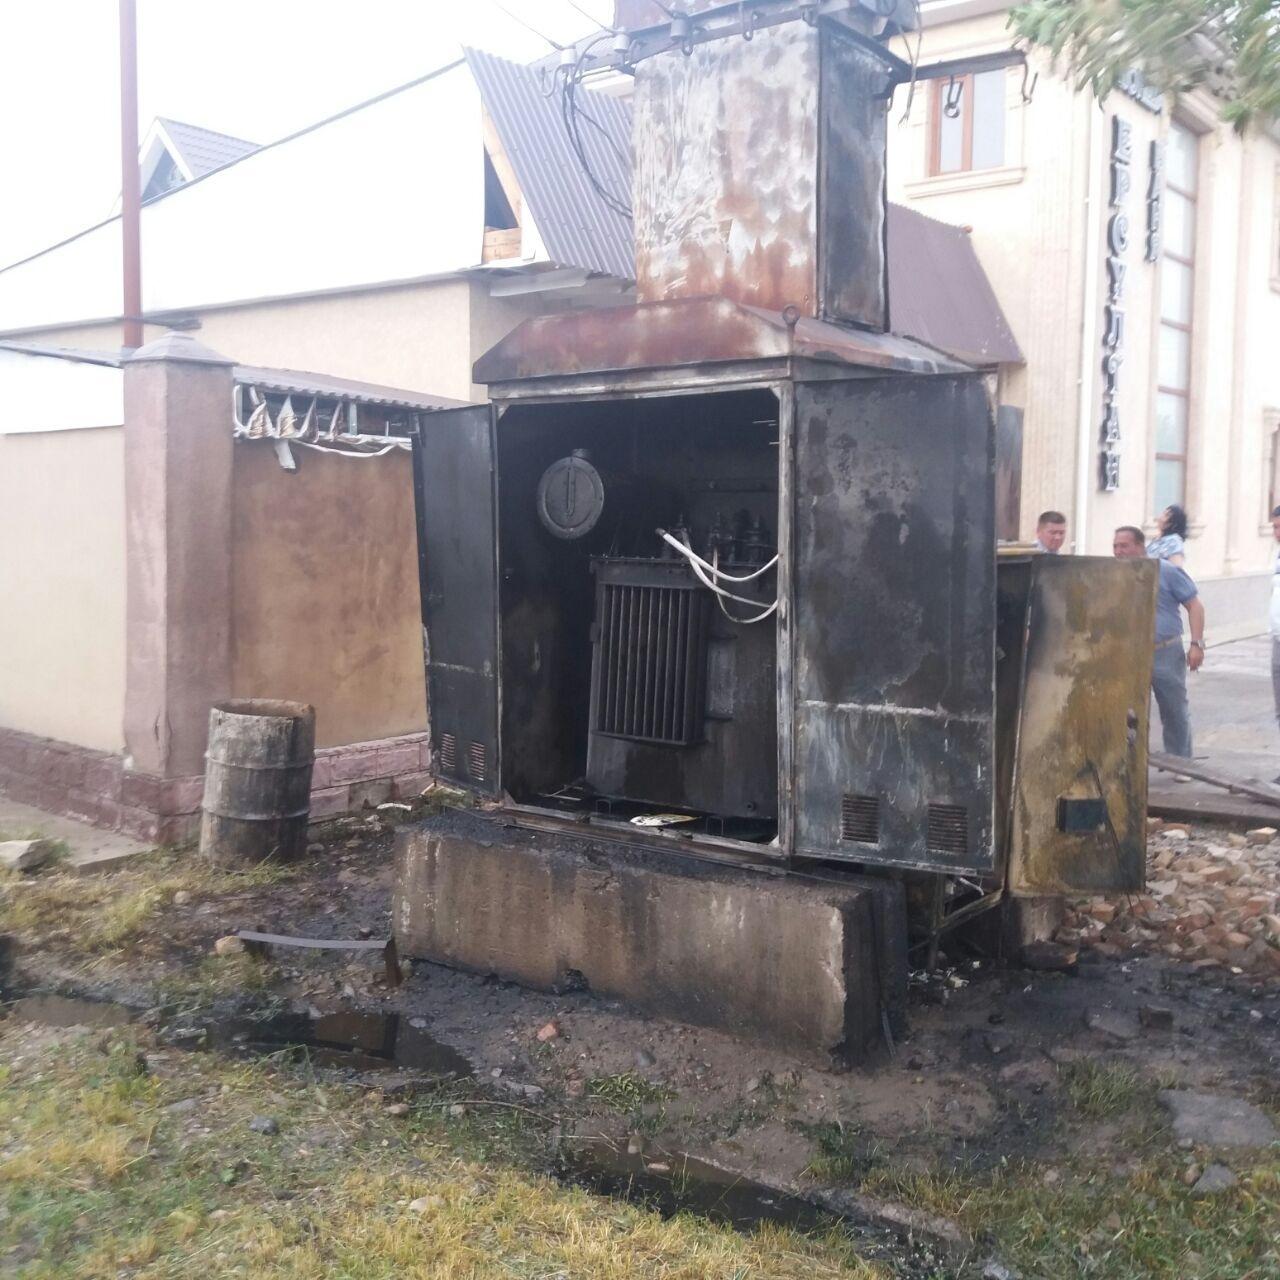 Подстанция в Таразе загорелась во время сильного ветра